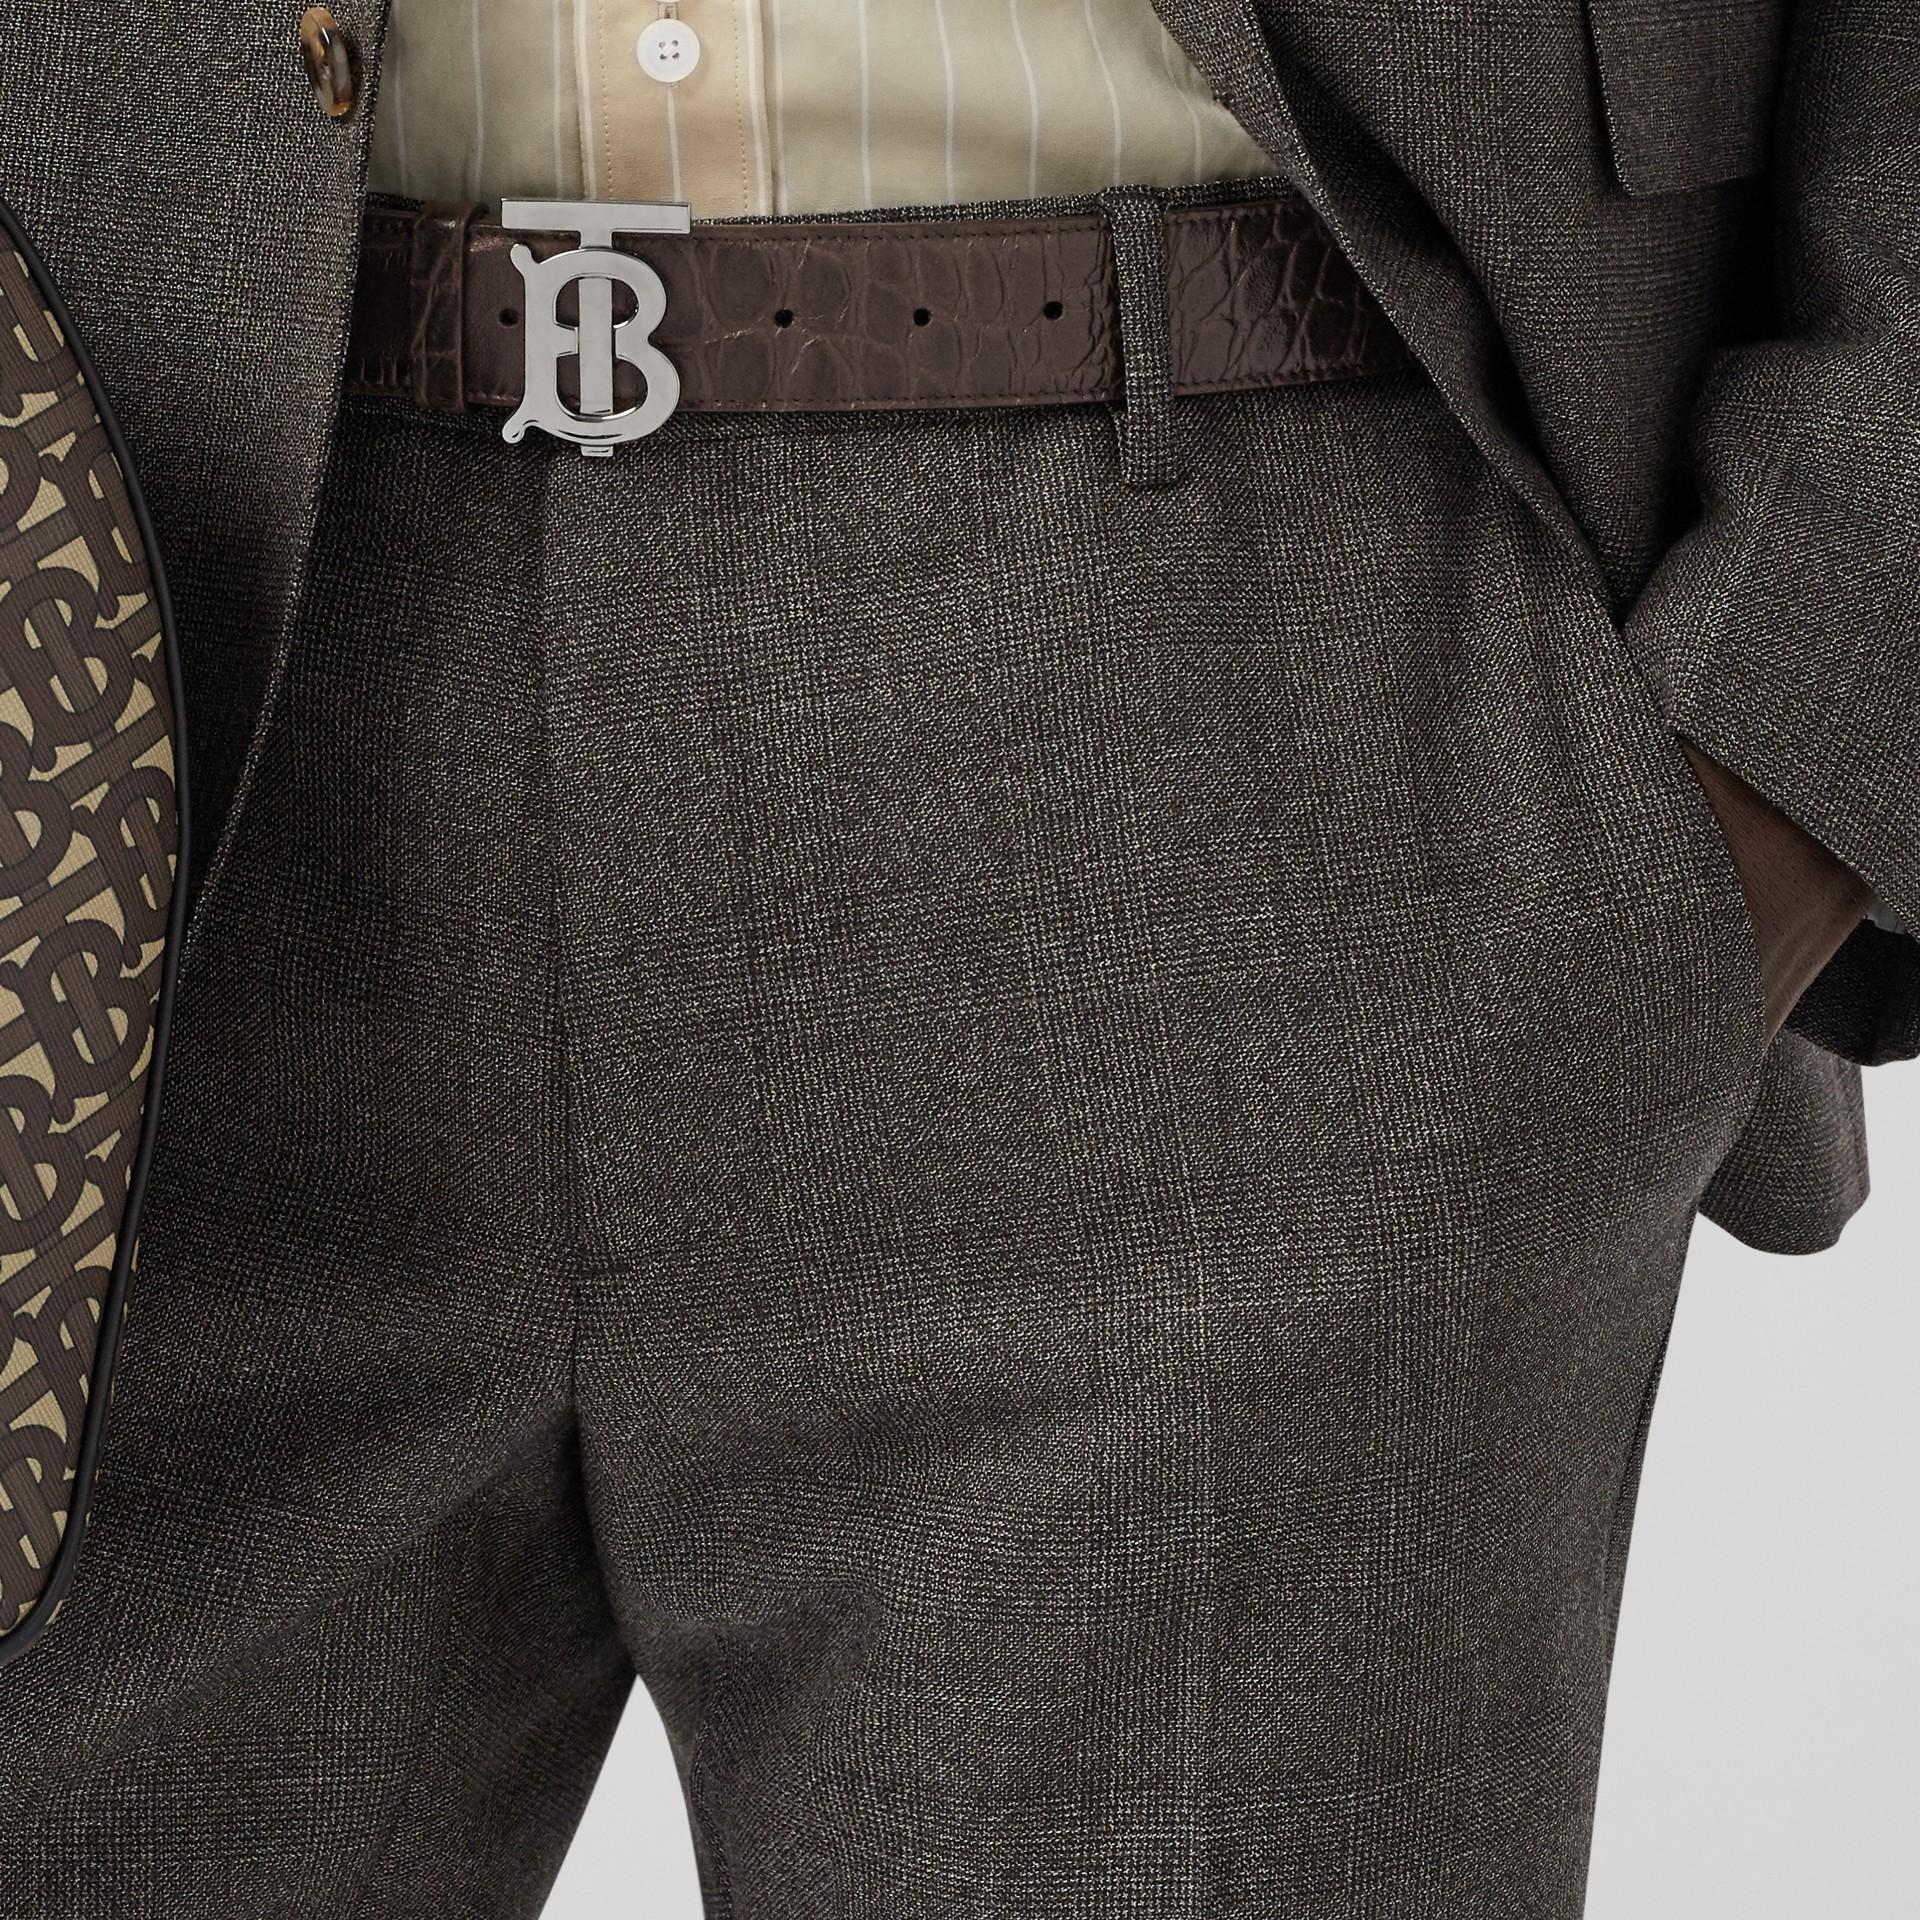 Monogram Motif Embossed Leather Belt in Brown - Men | Burberry - gallery image 2